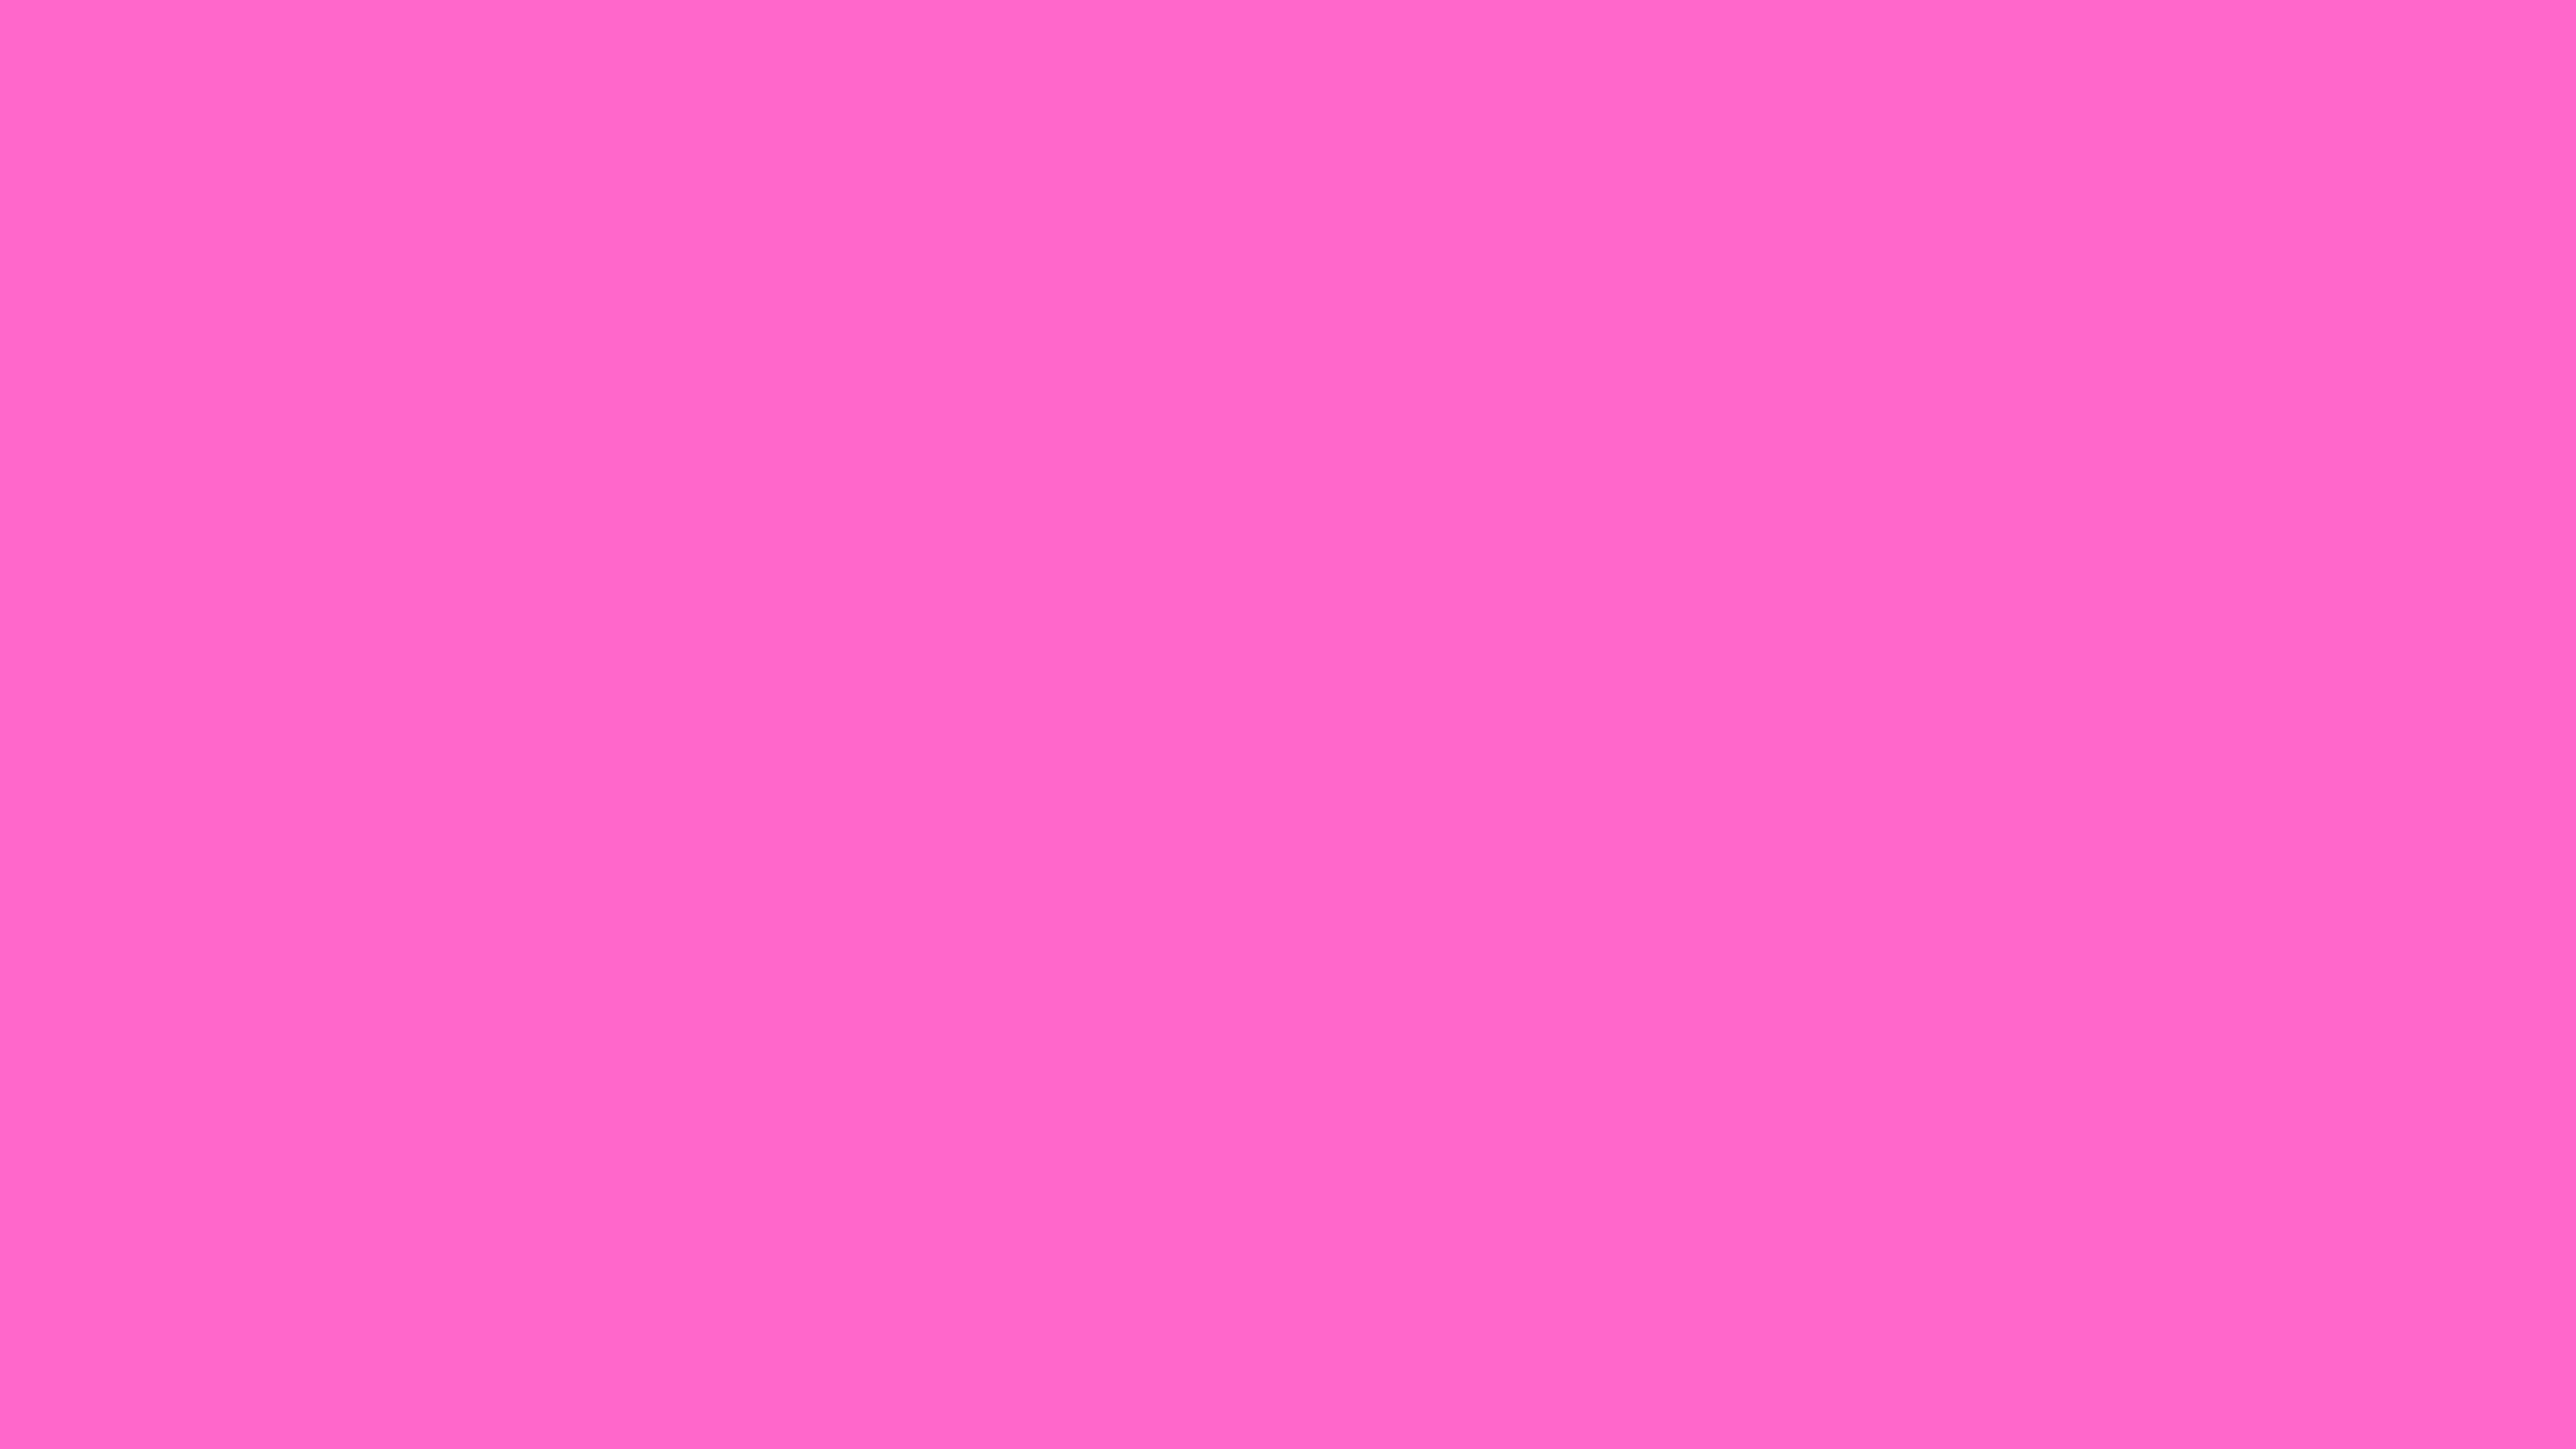 4096x2304 Rose Pink Solid Color Background